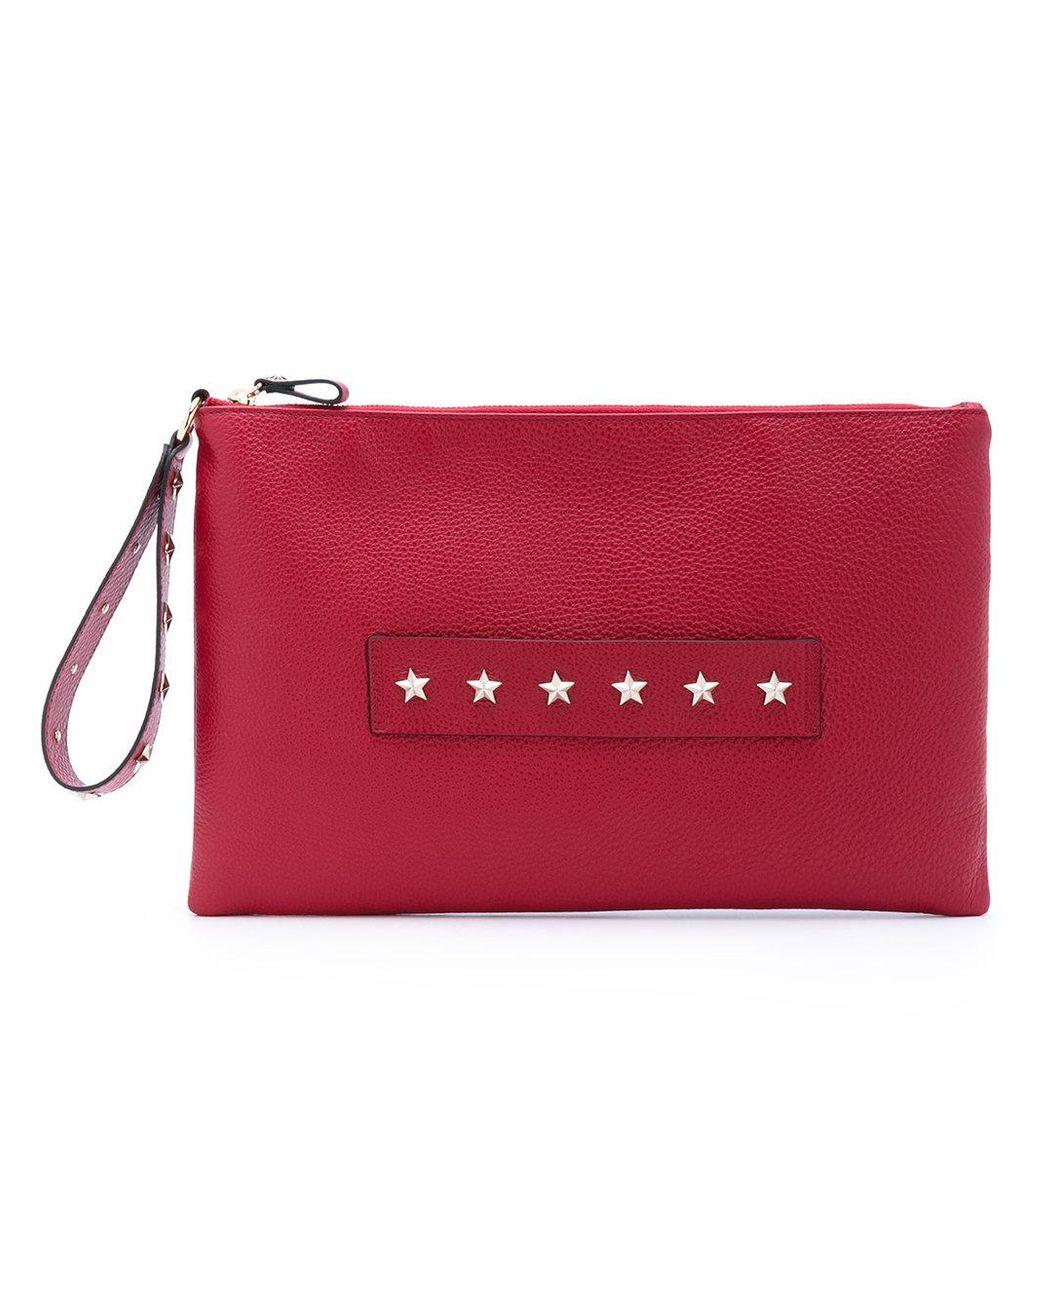 Женские сумки Valentino - купить женские сумки Valentino в